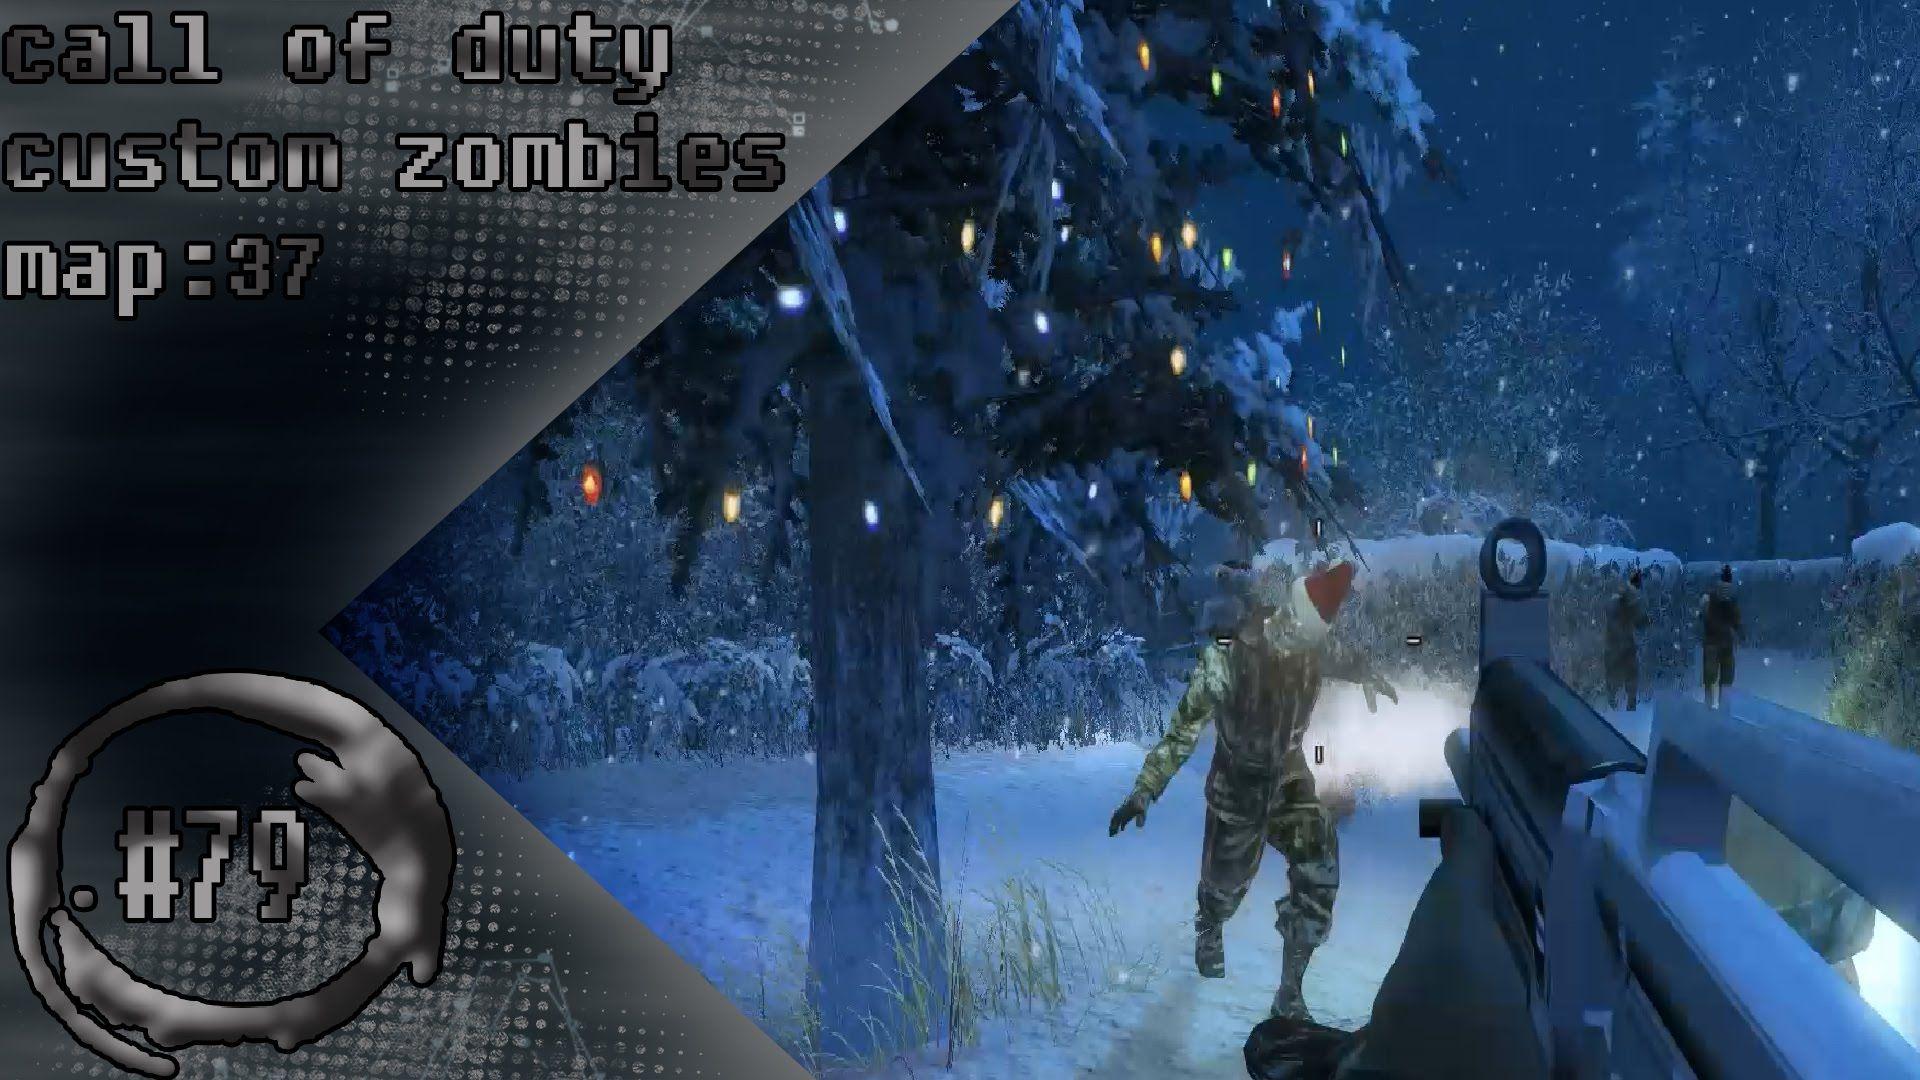 CALL OF DUTY CUSTOM ZOMBIES MAP 37 PART 1 ITS SANTA | call of duty ...